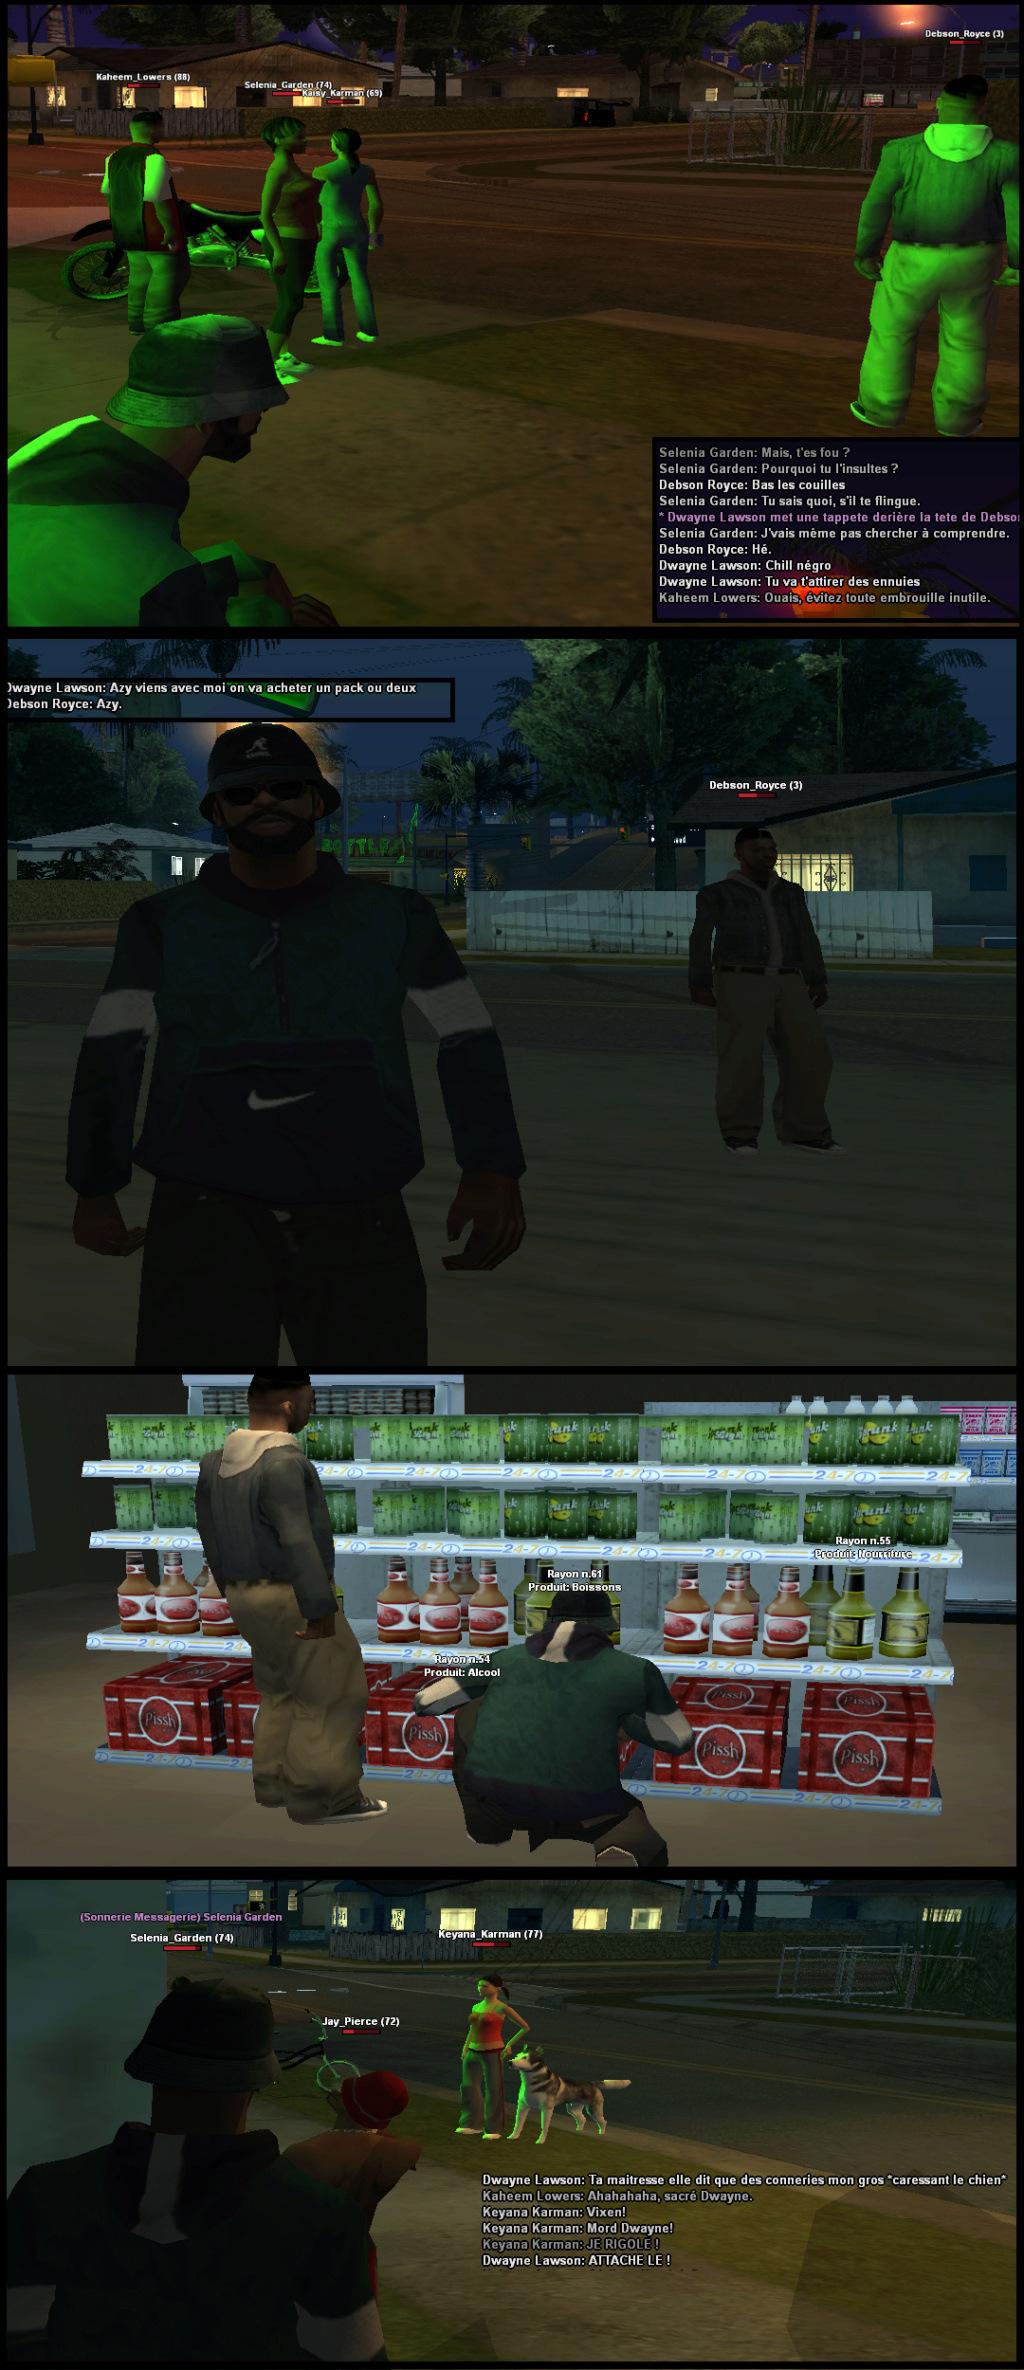 (PED) (GANG) Grove Street Mafia Crips - Page 12 Screen10